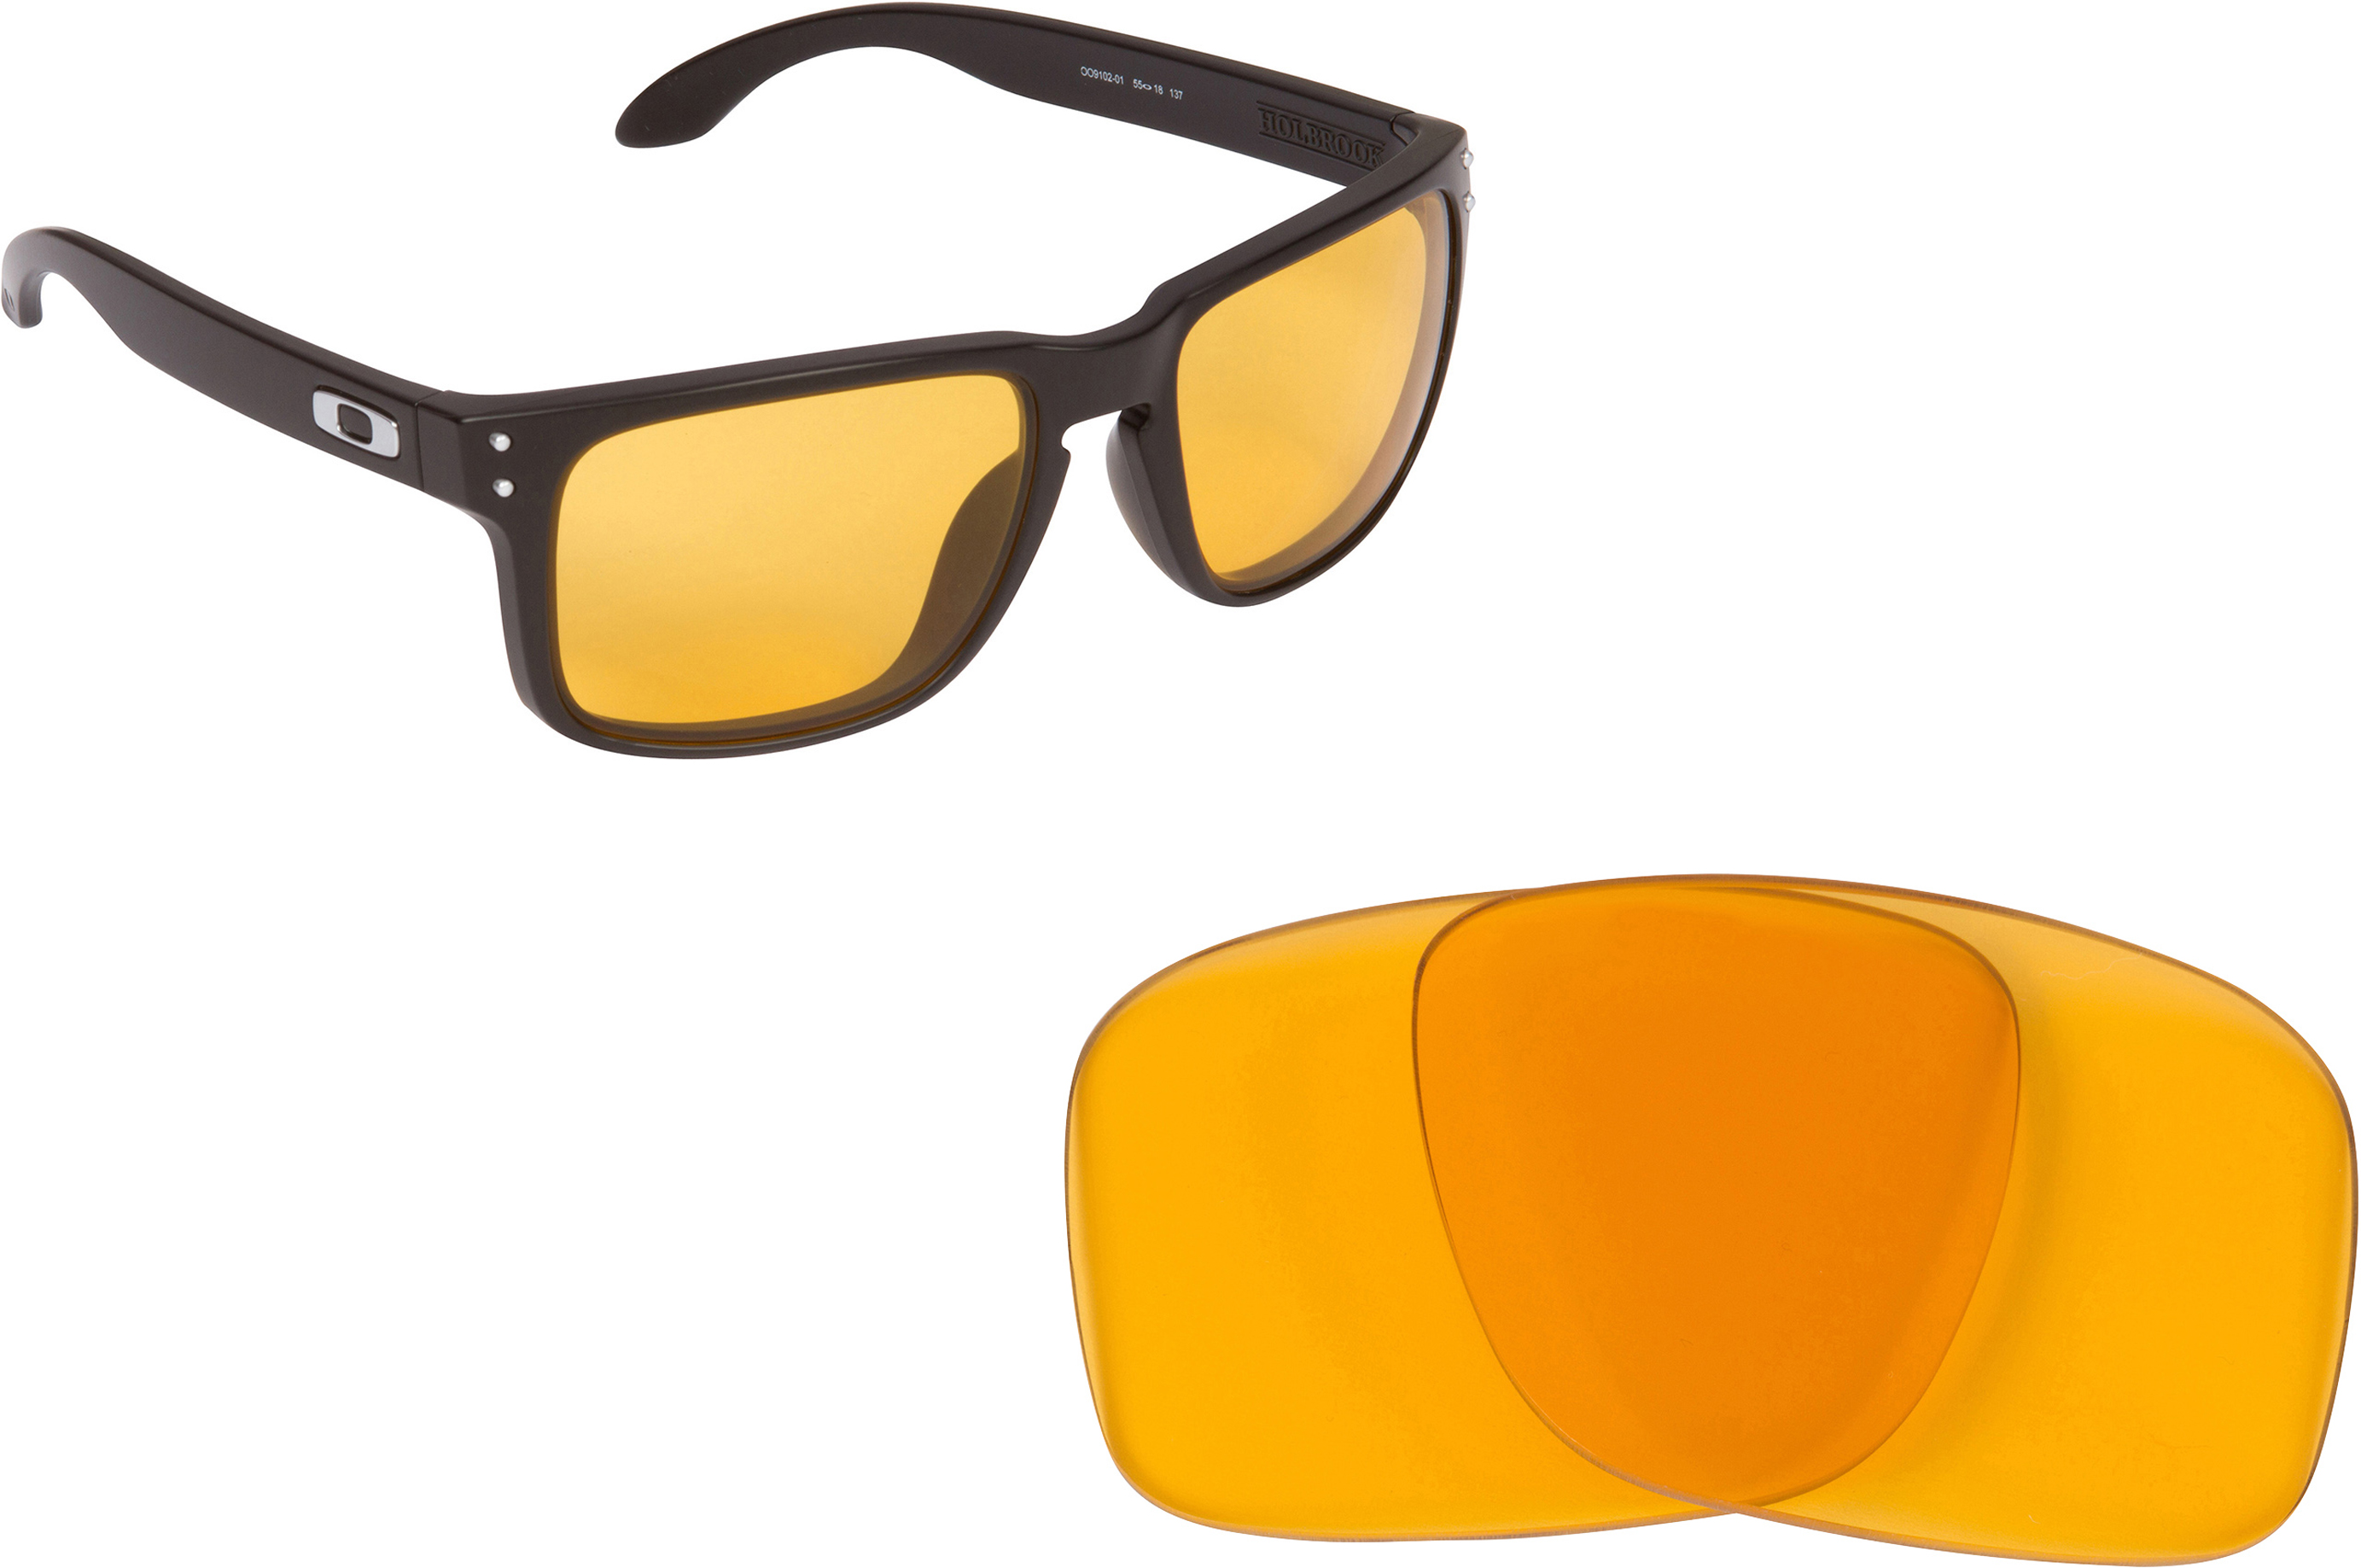 6c50bdcb7be Oakley High Intensity Yellow Night